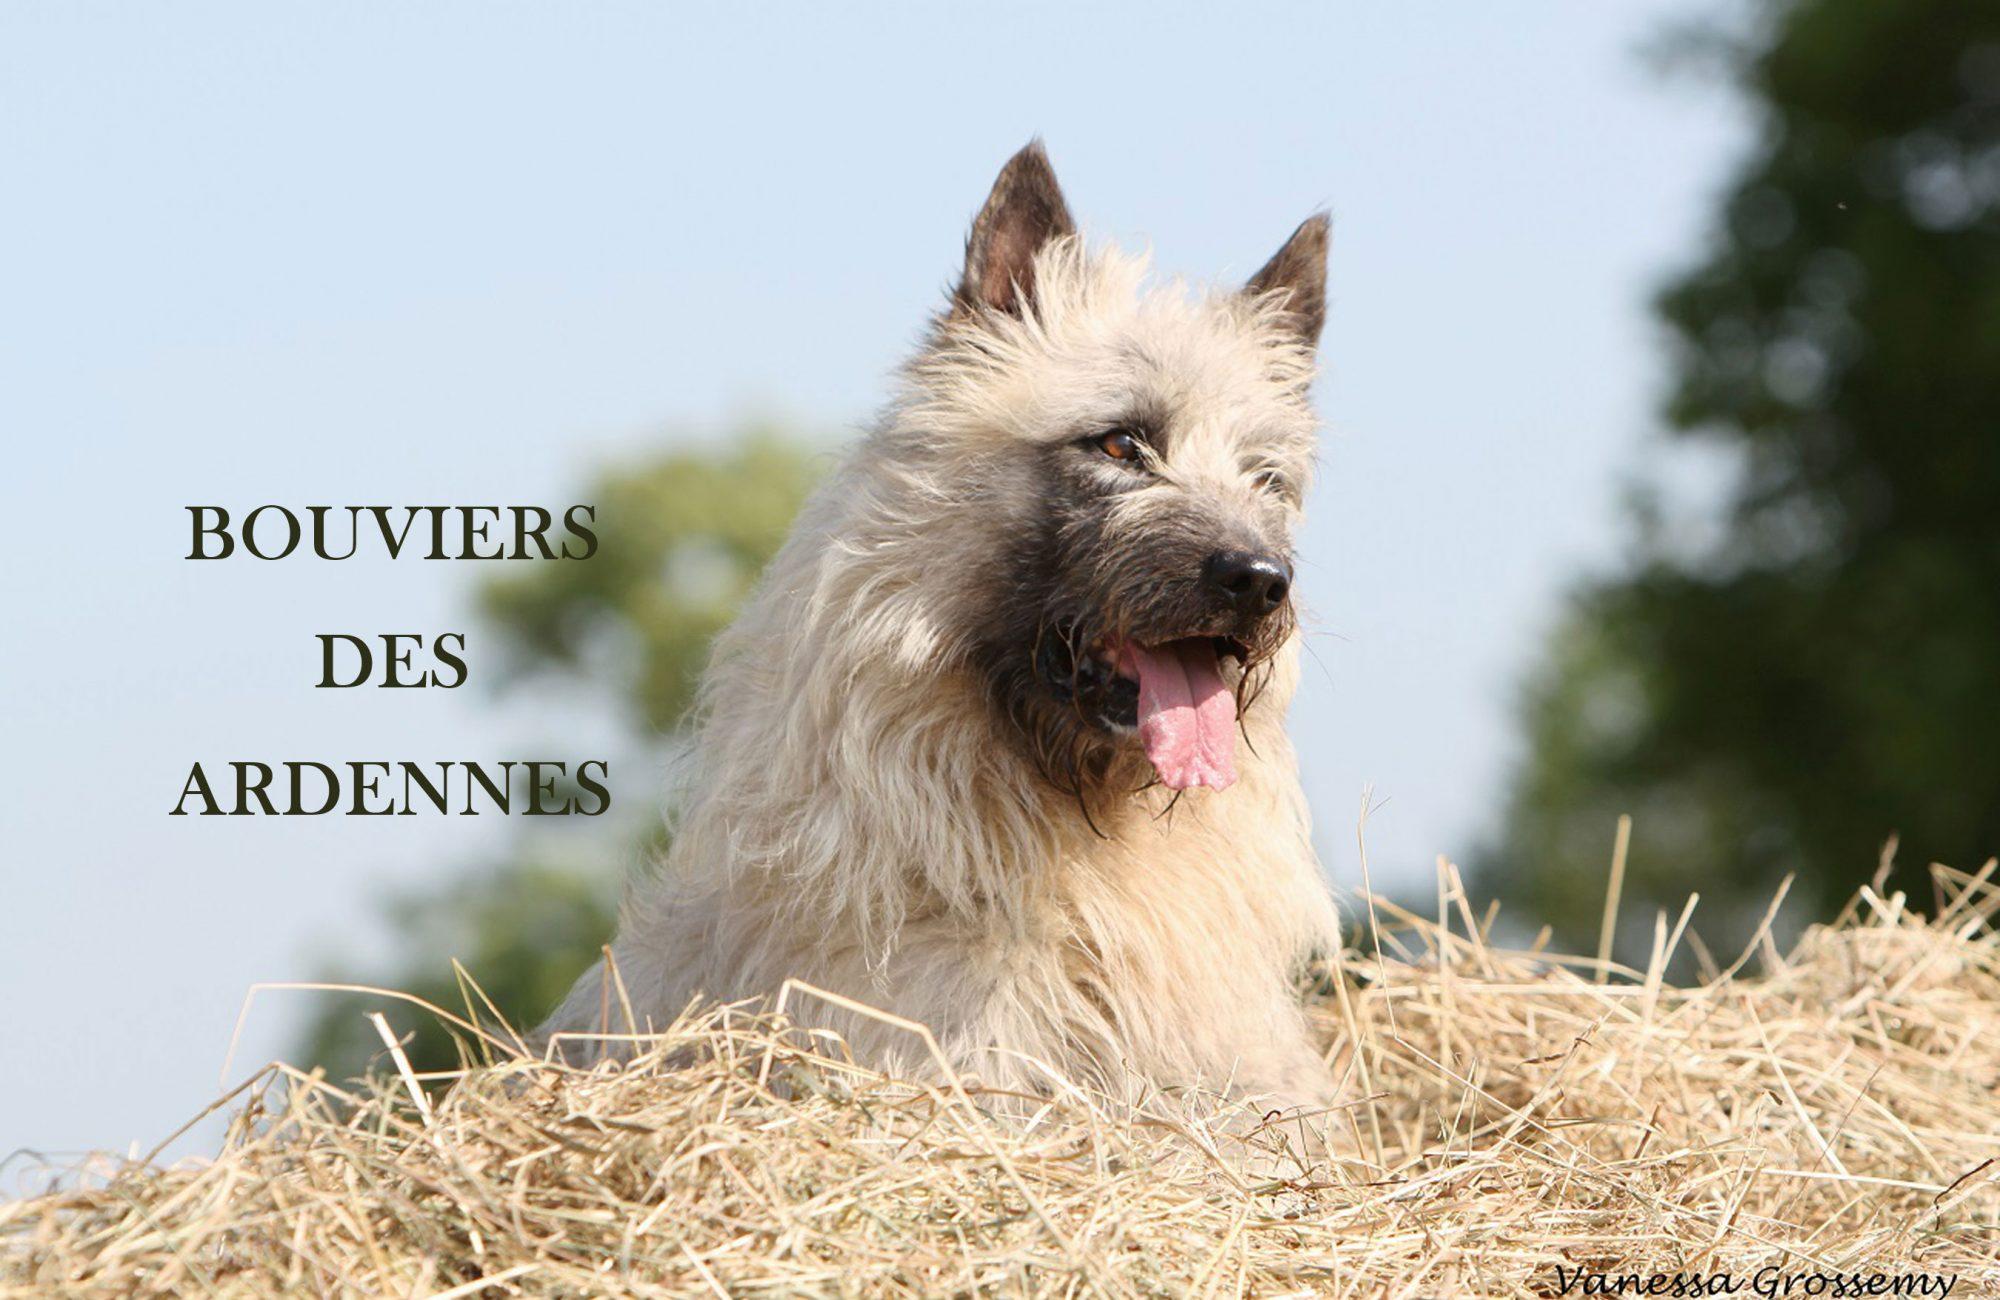 Bouviers des Ardennes